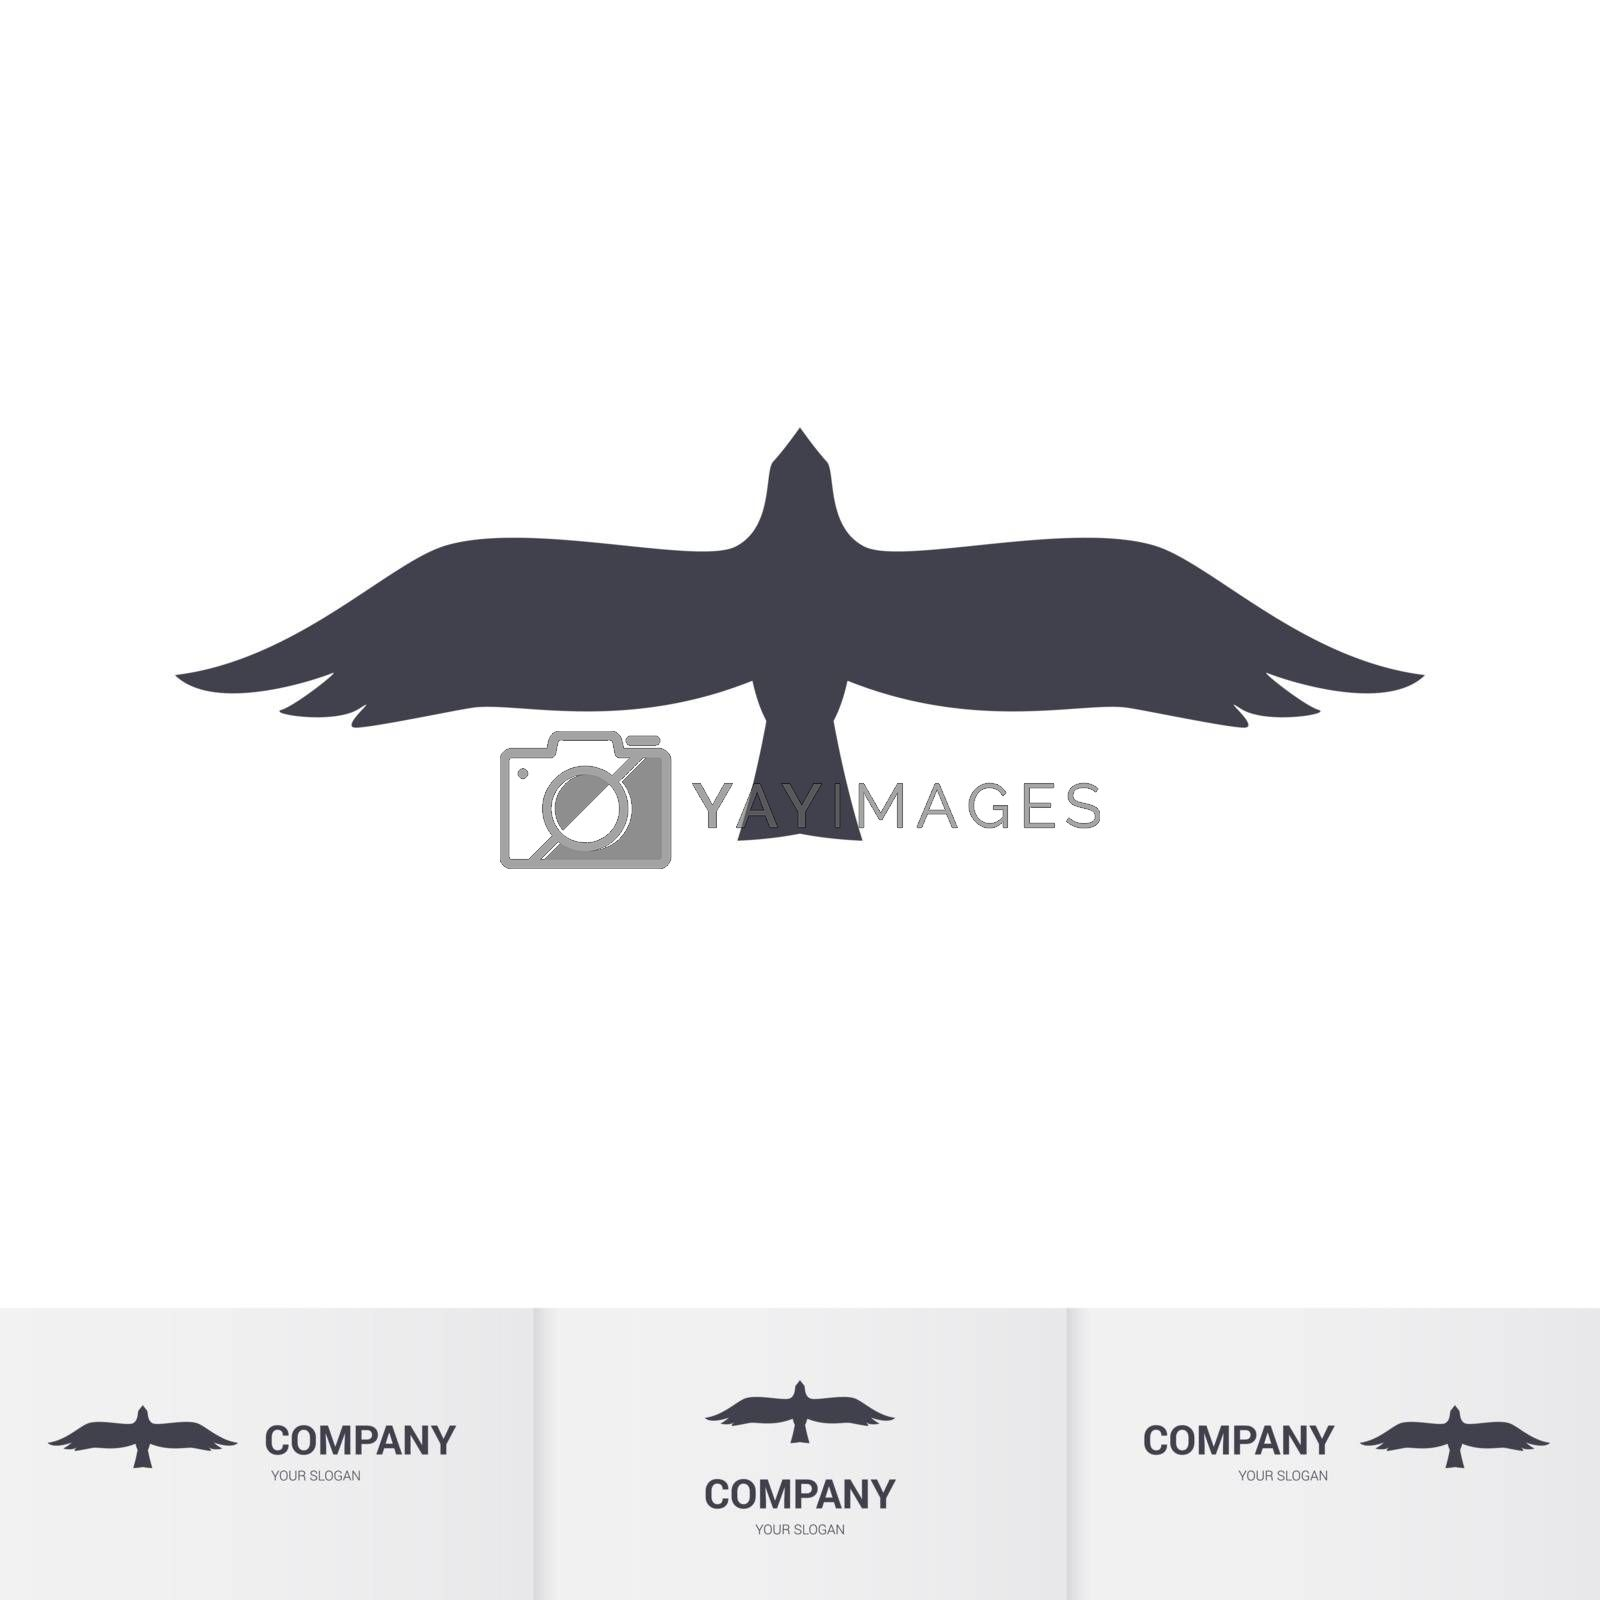 Simple Dark Bird of Prey for Mascot Logo Template on White